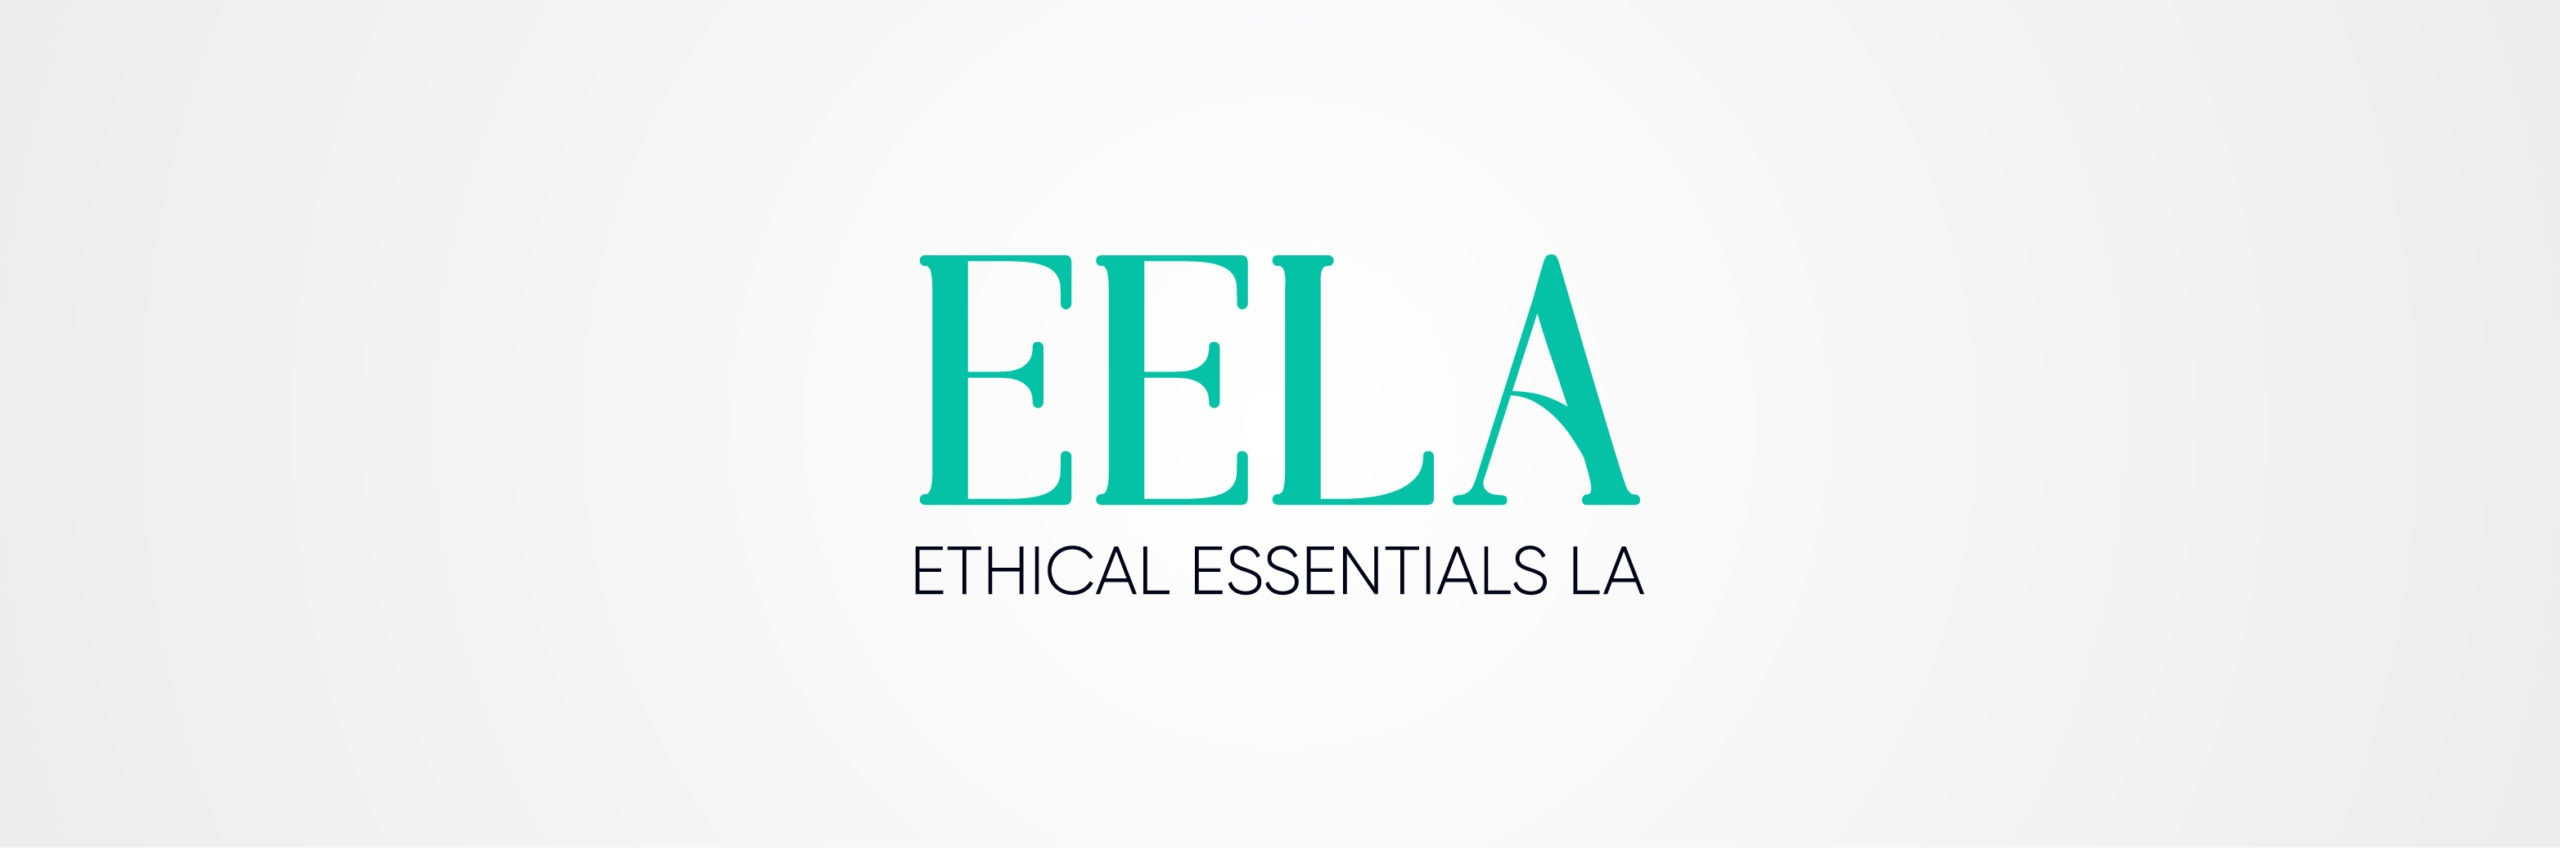 Ethical Essentials L.A. logo